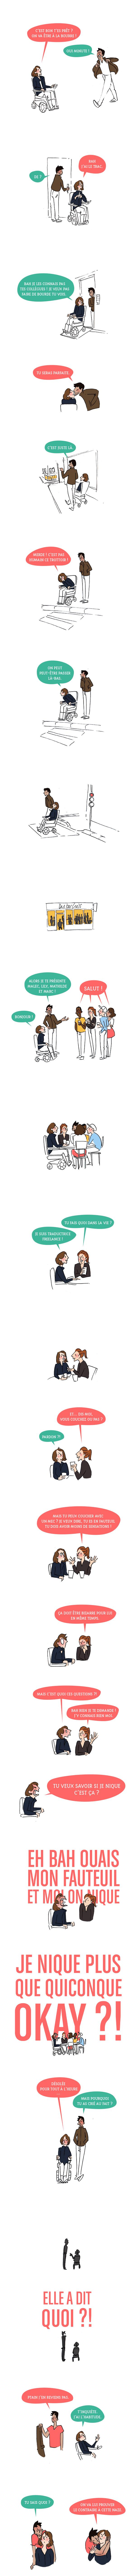 relations-sexuelles-handicap-3